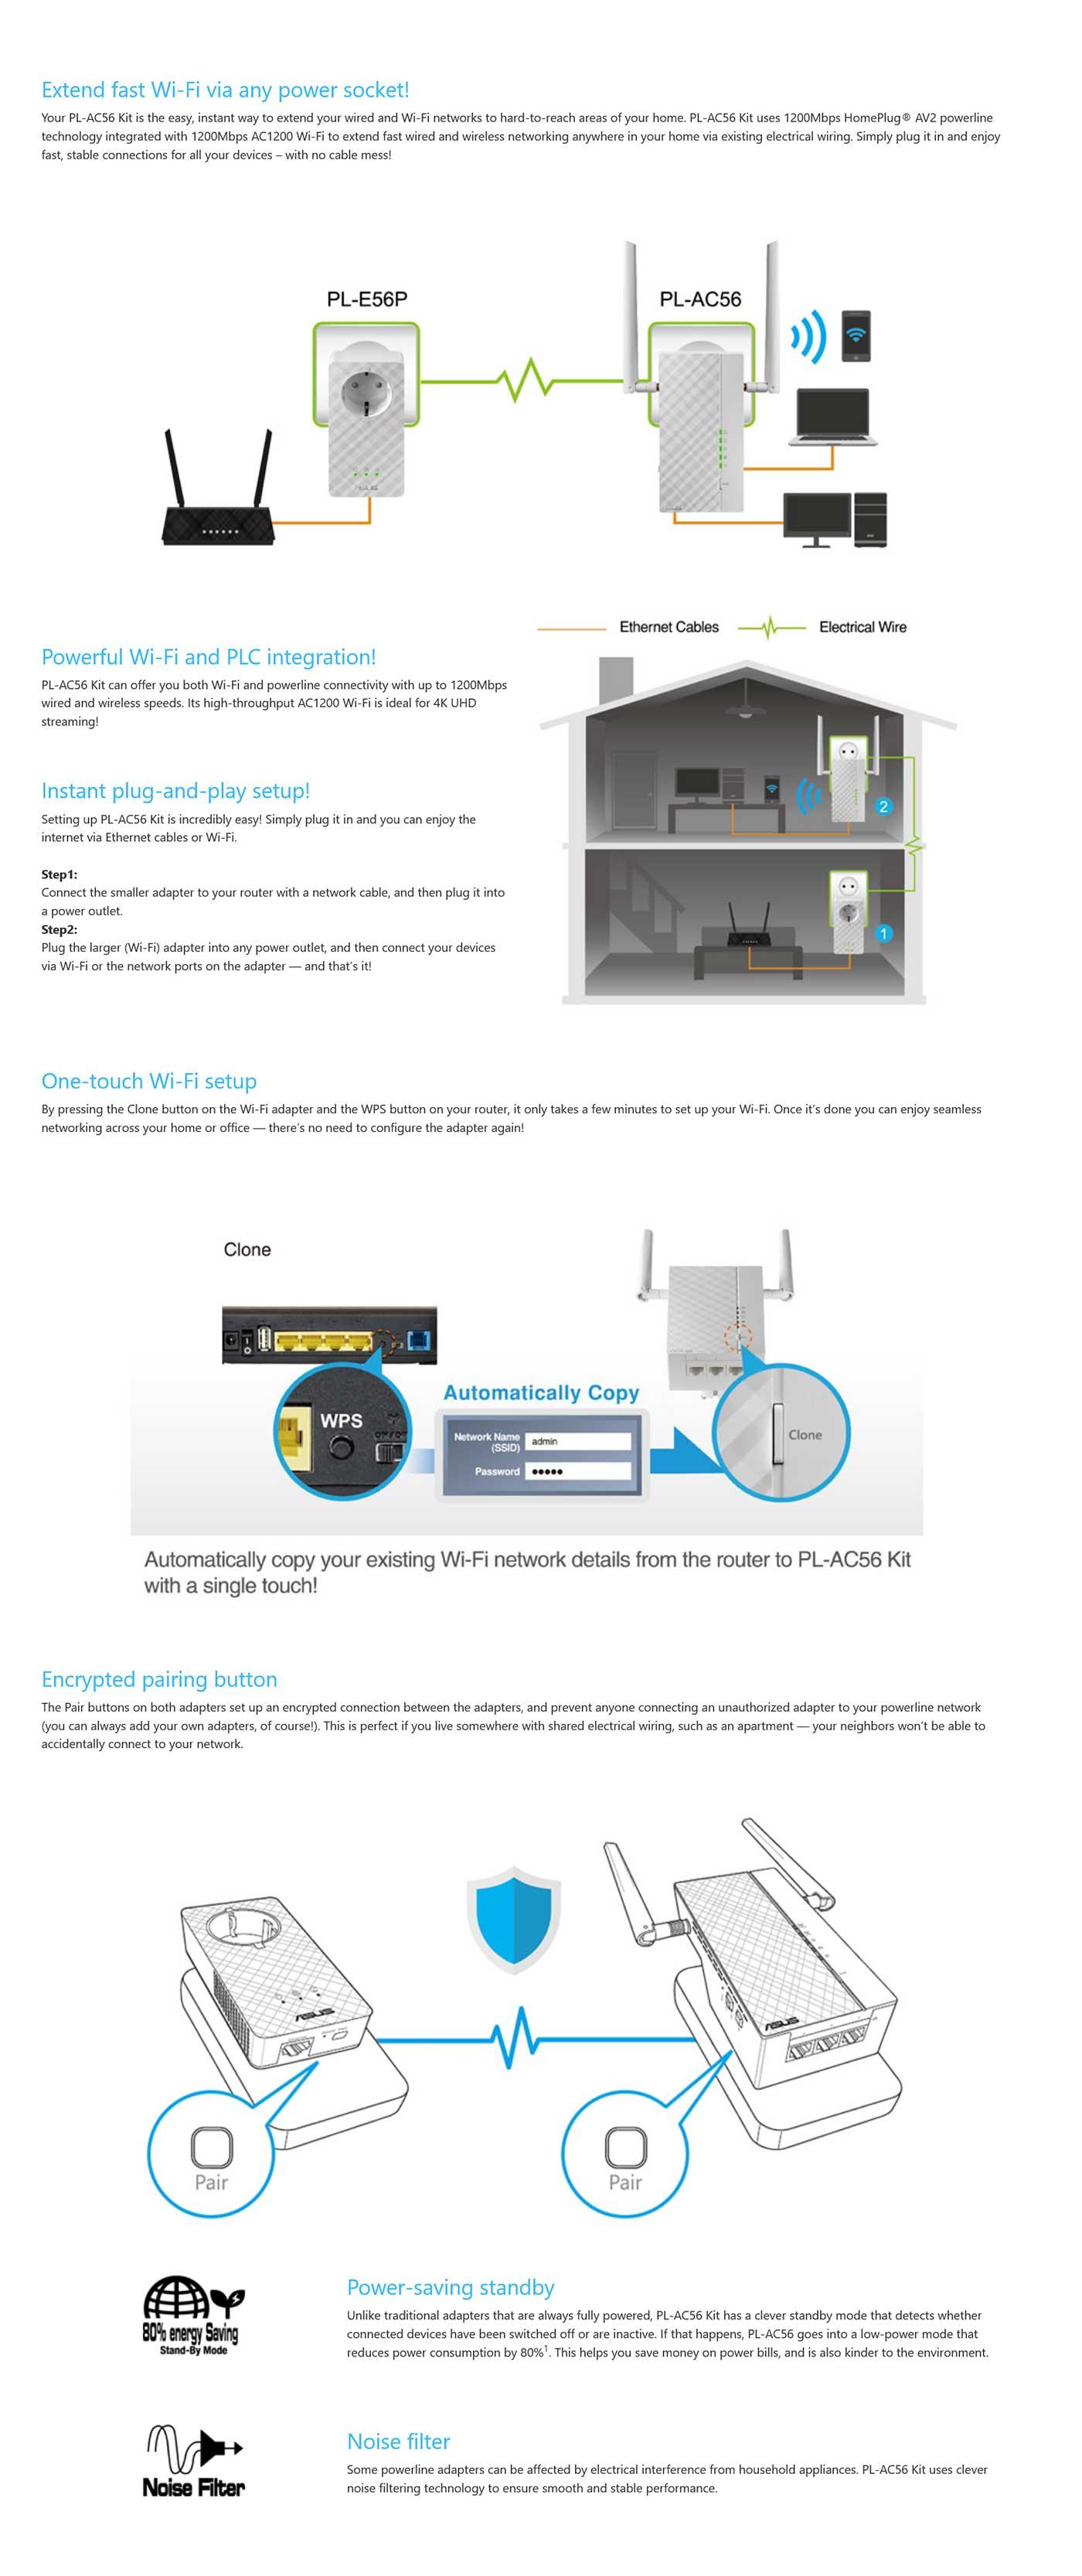 ASUS-PL-AC56-KIT-1200Mbps Powerline Adapter Kit Details